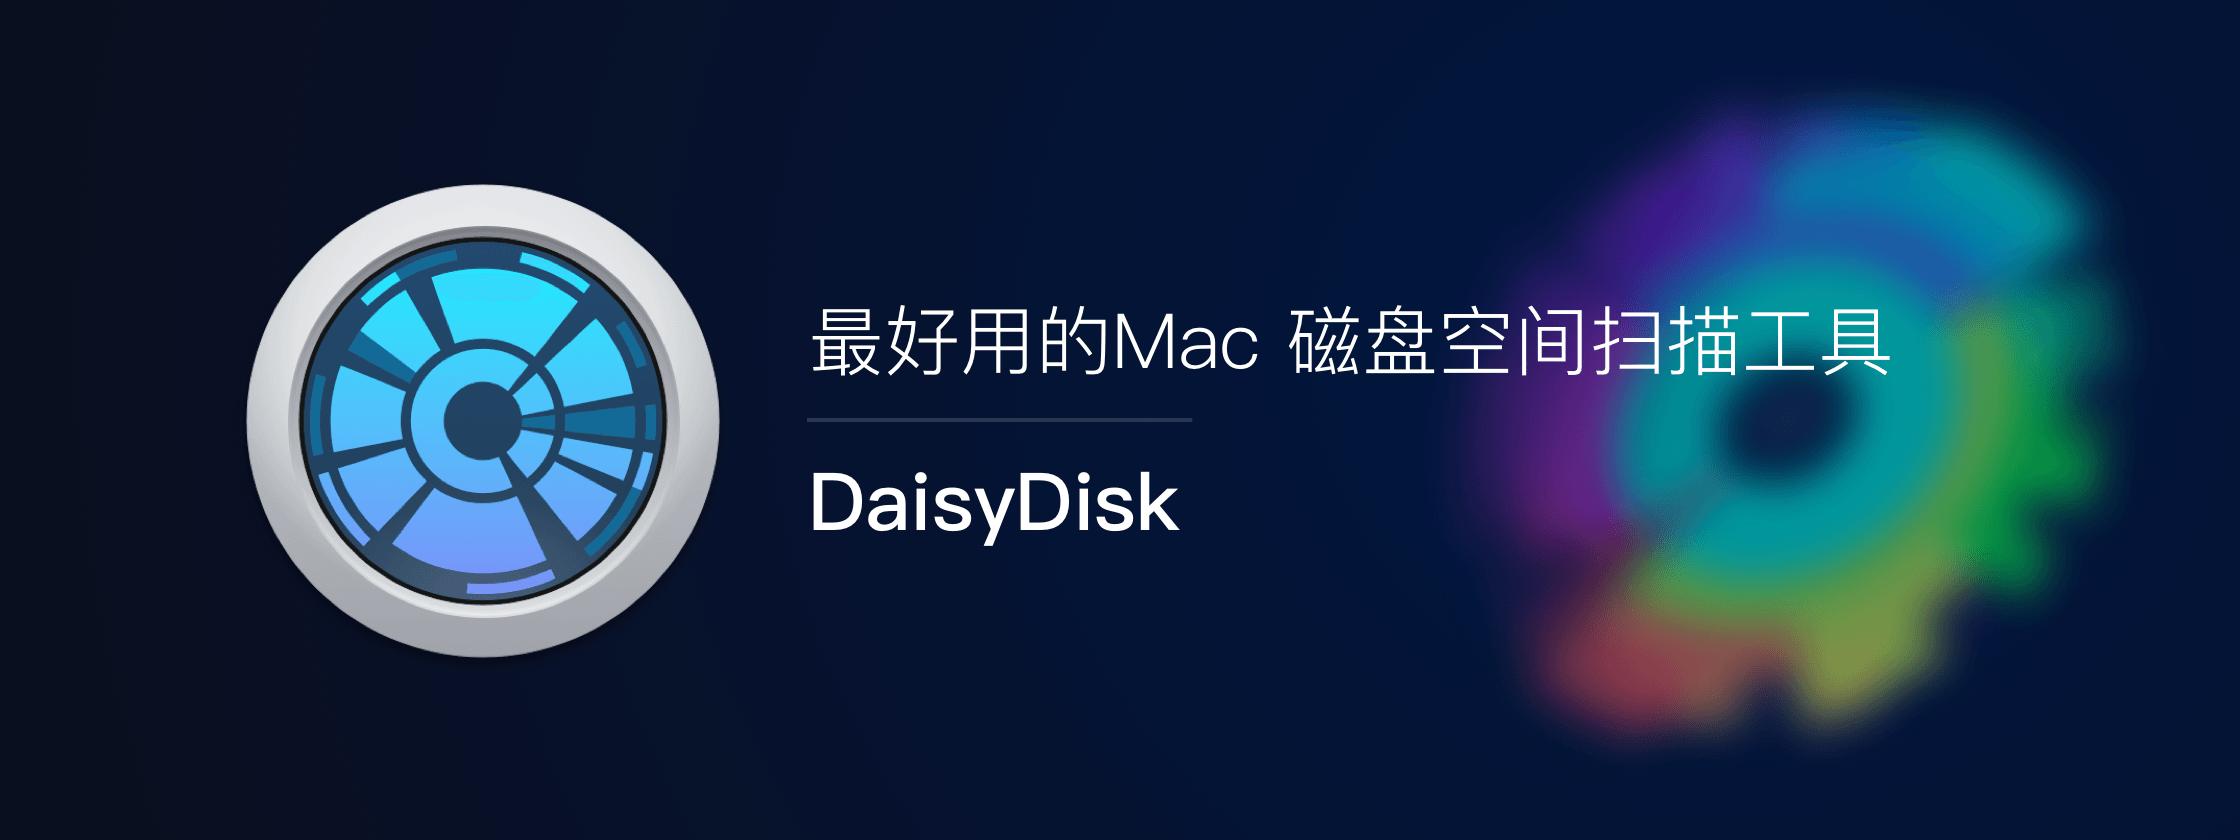 DaisyDisk – 最好用的 Mac 磁盘空间扫描工具